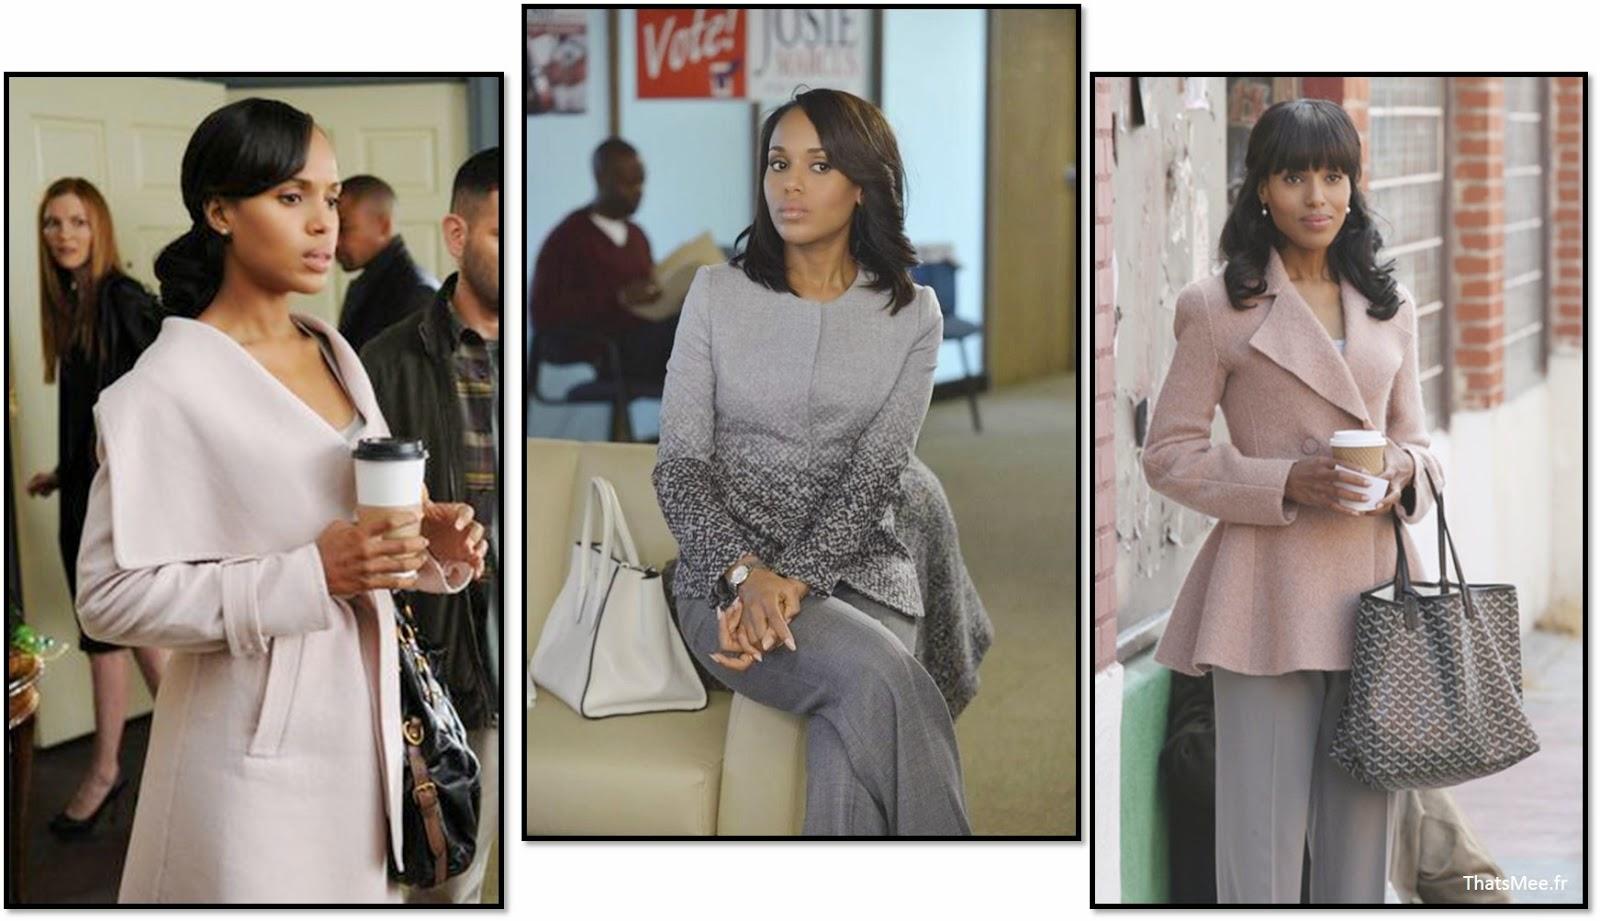 Manteau salvatore Ferragamo, sac shopping Goyard bleu Olivia Pope look outfit scandal serie Kerry Washington